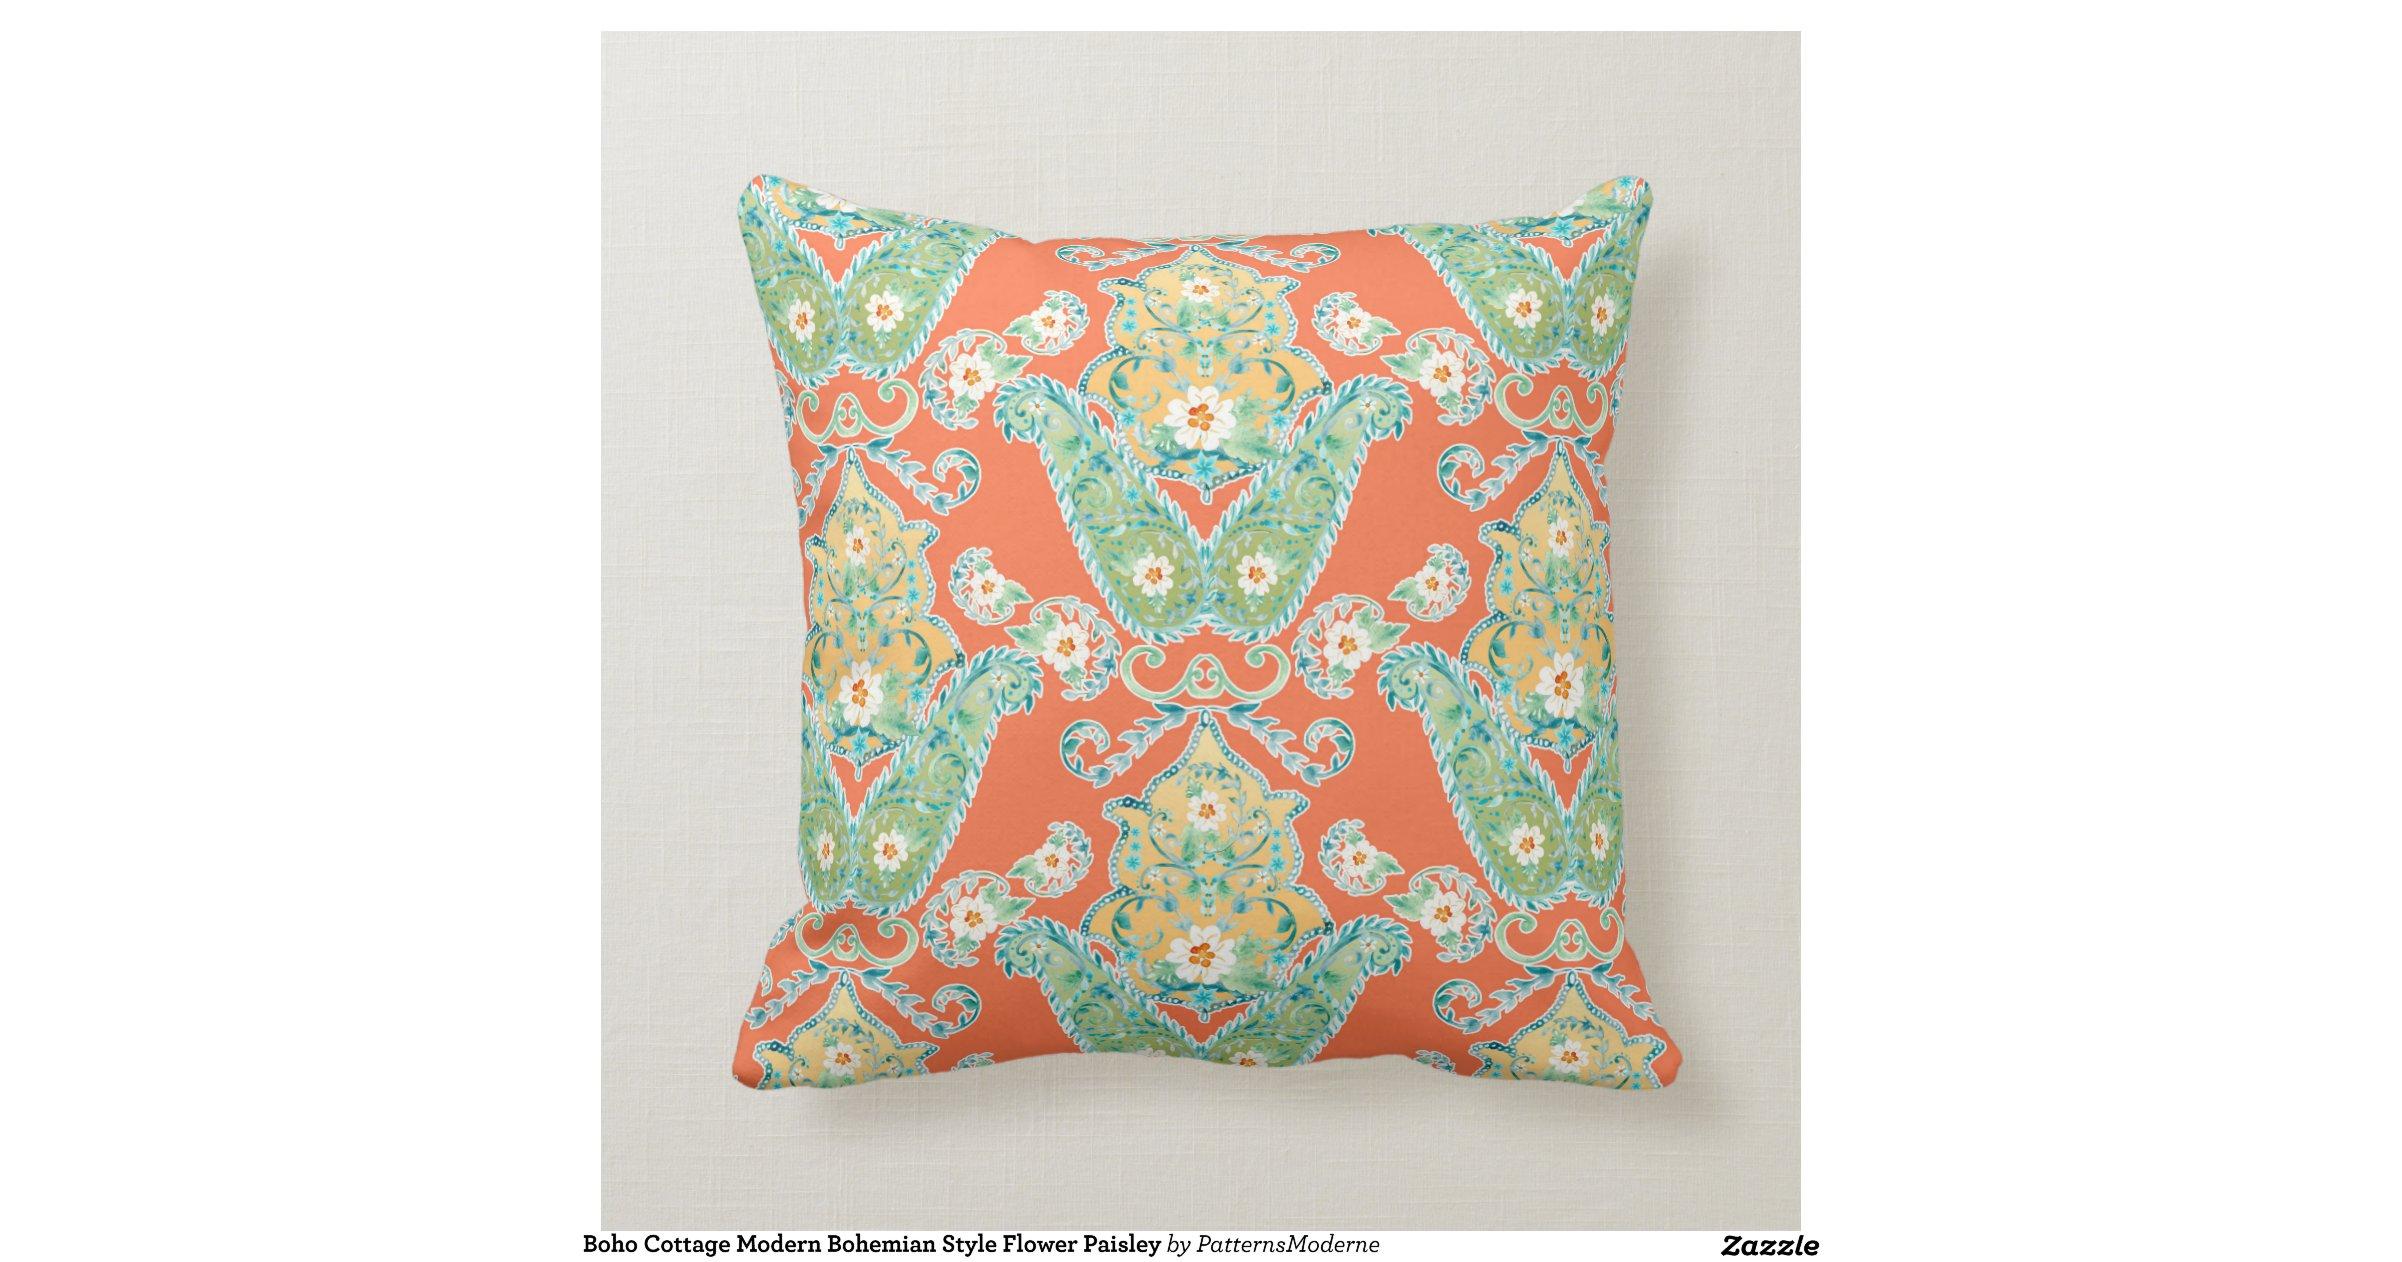 Boho Cottage Modern Bohemian Style Flower Paisley Throw Pillow Zazzle